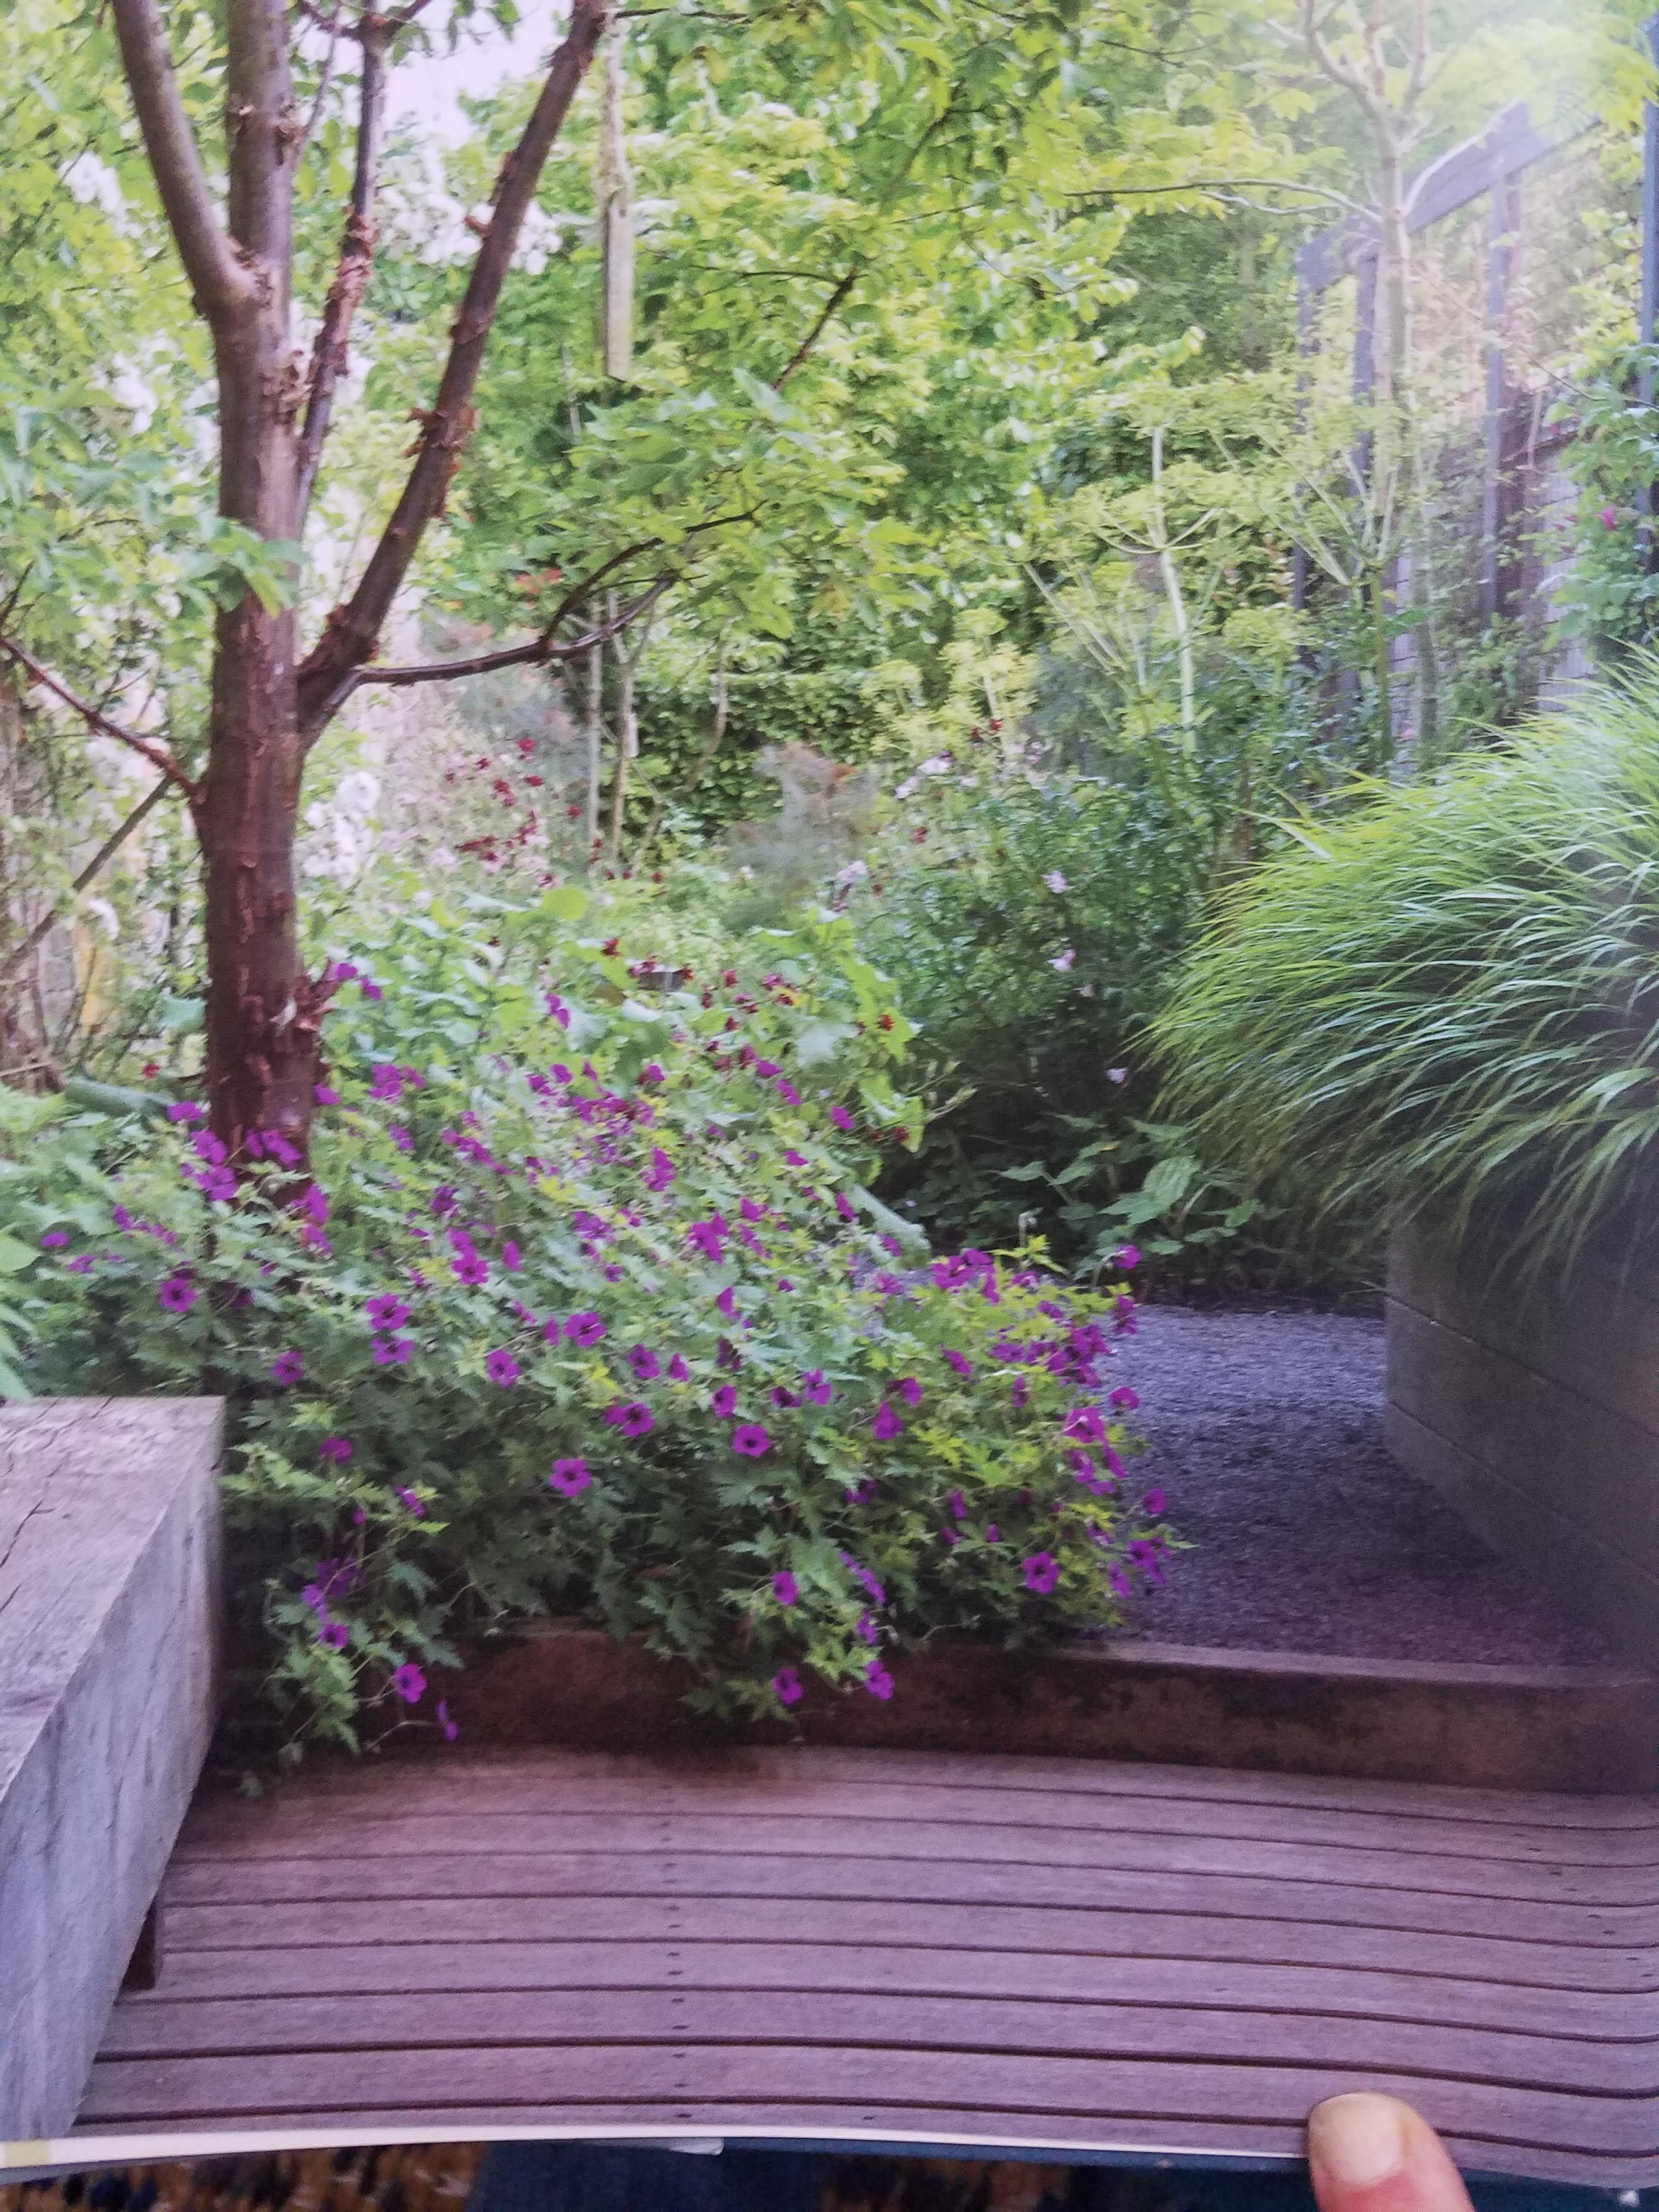 From Noel Kingsbury S New Small Garden With Photos By Maayke De Ridder Small Garden Garden Landscape